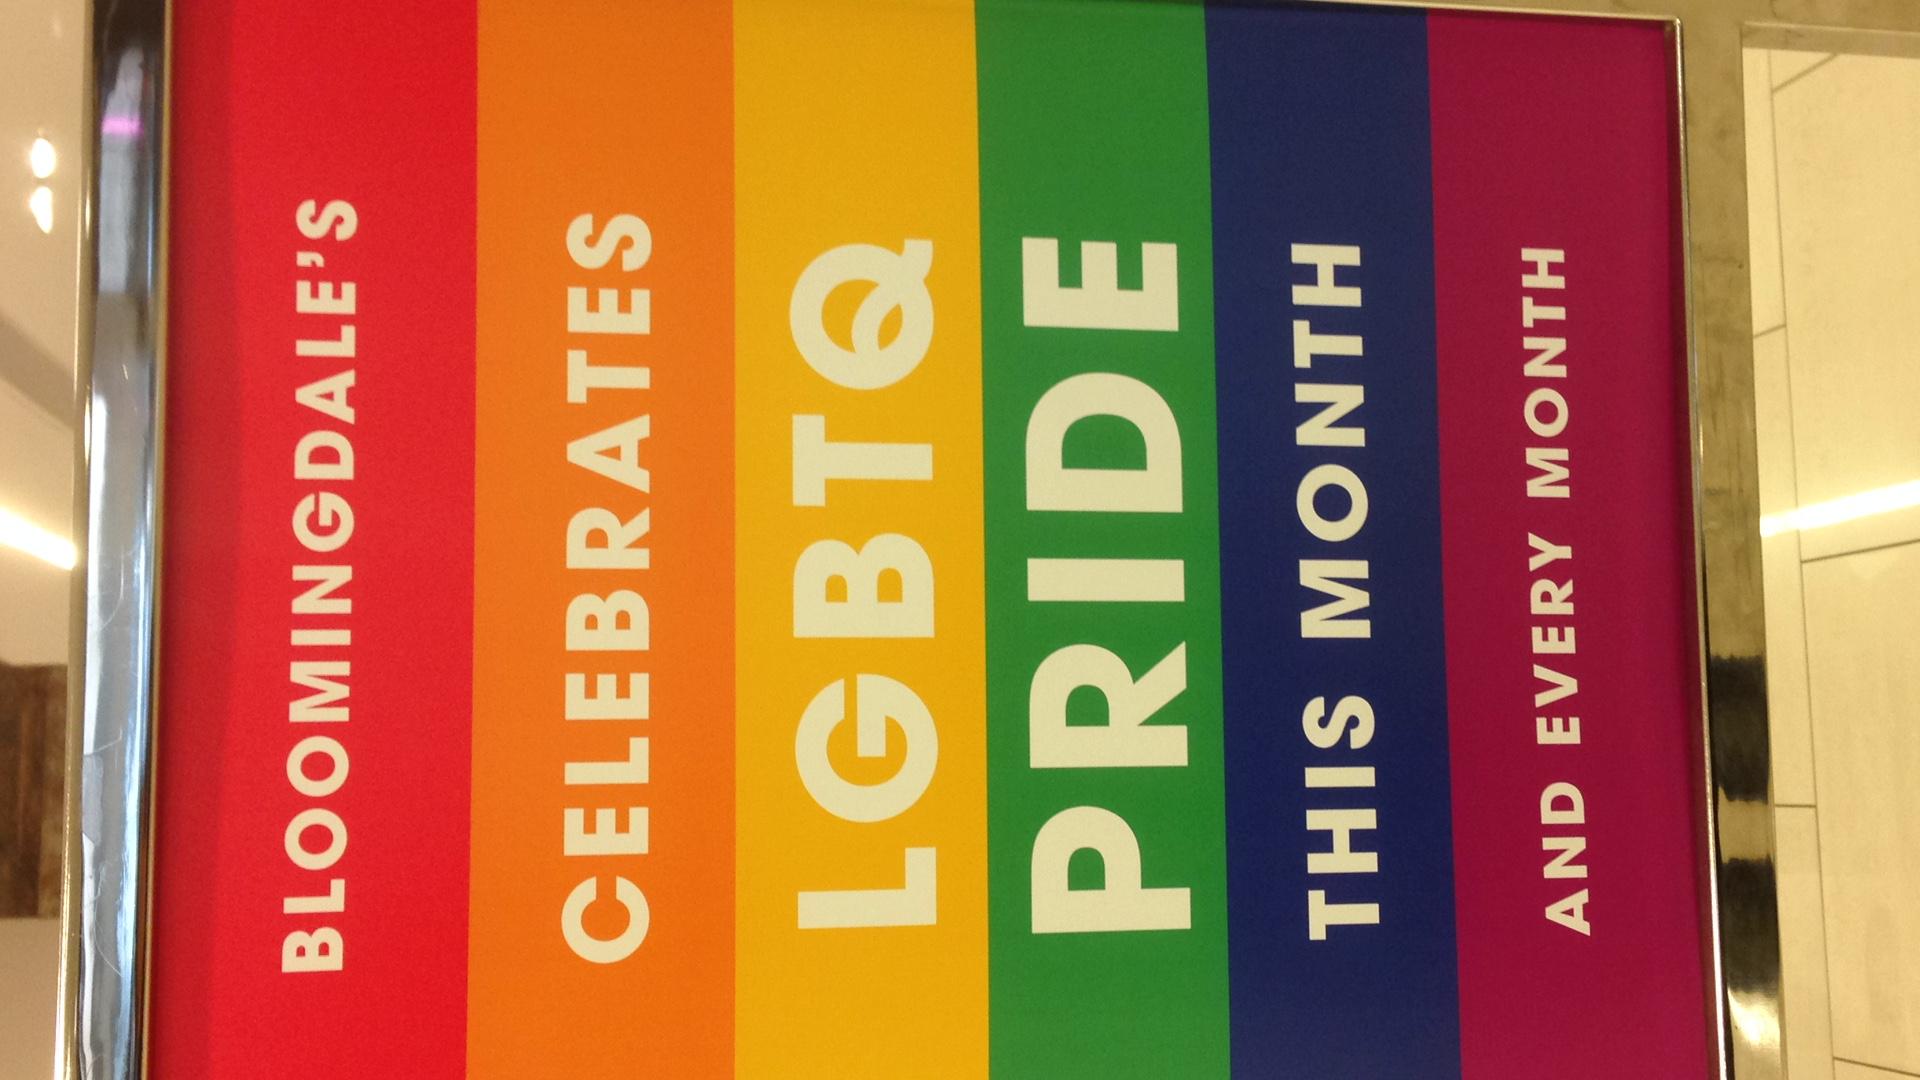 Club di sesso gay a San Francisco